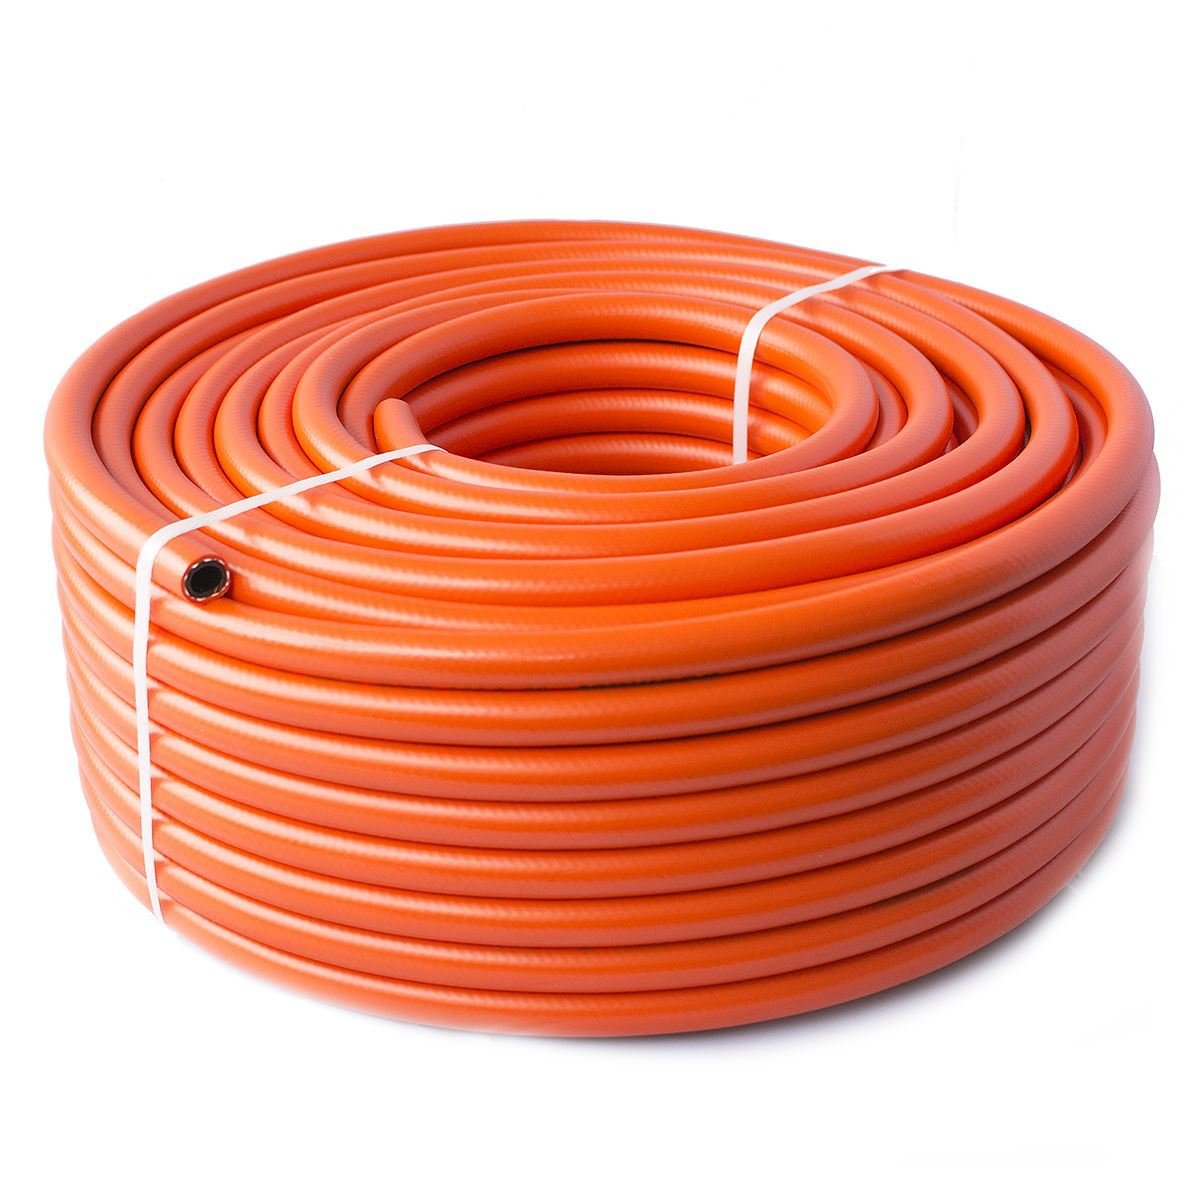 1.6m - Propane Butane LPG Gas hose pipe for Camping Caravan BBQ - High pressure - 9 mm Quantum Garden